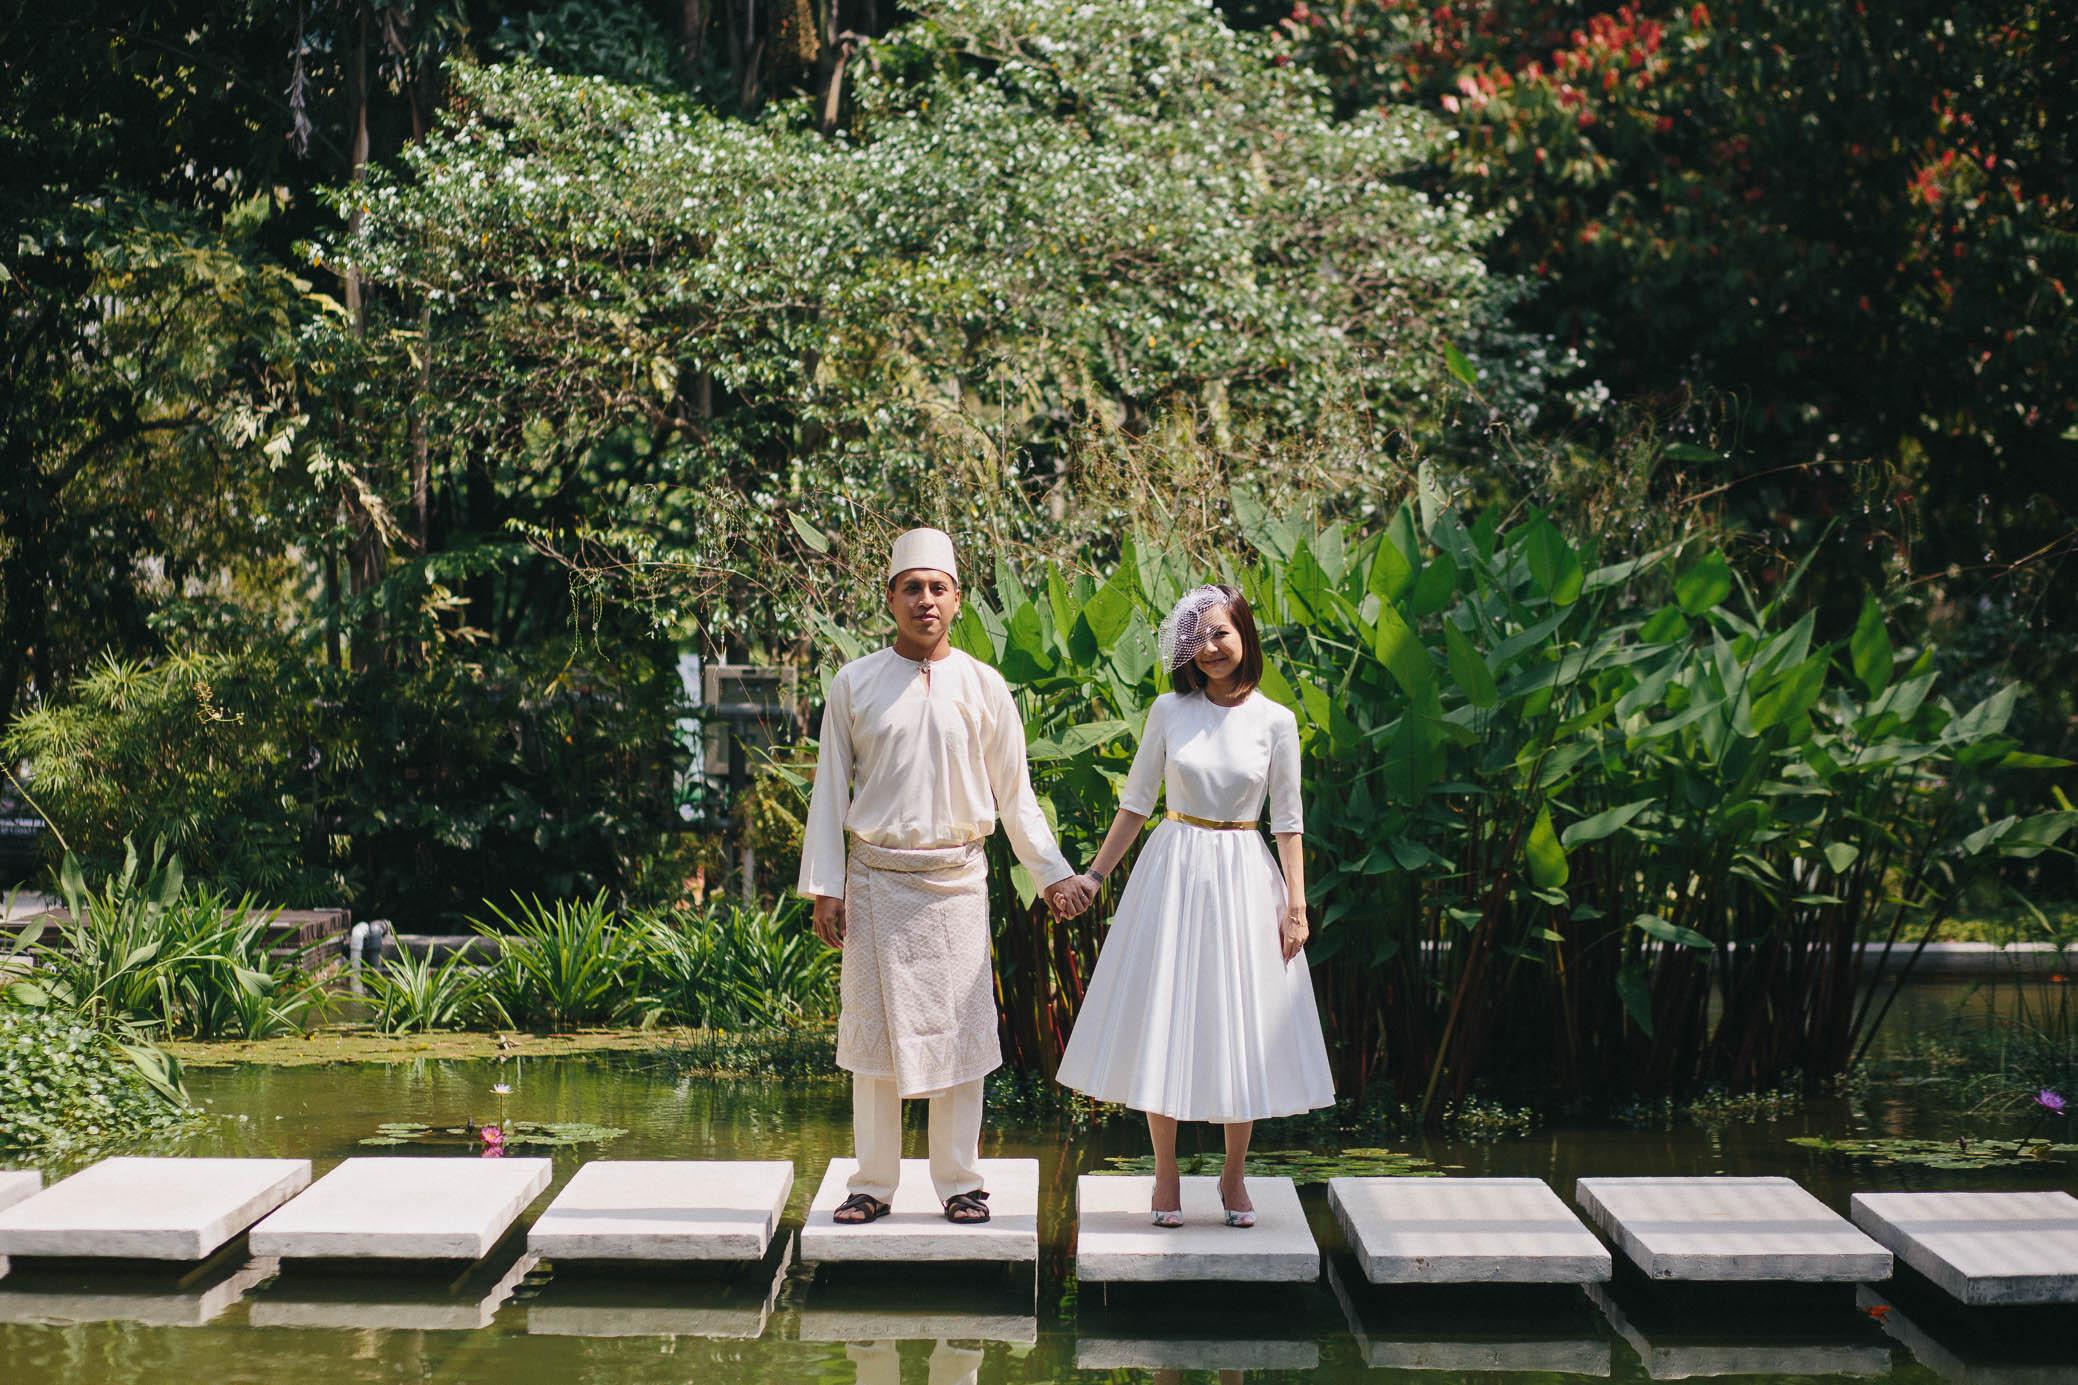 singapore-wedding-photographer-malay-indian-pre-wedding-travel-wmt-2015-81.jpg